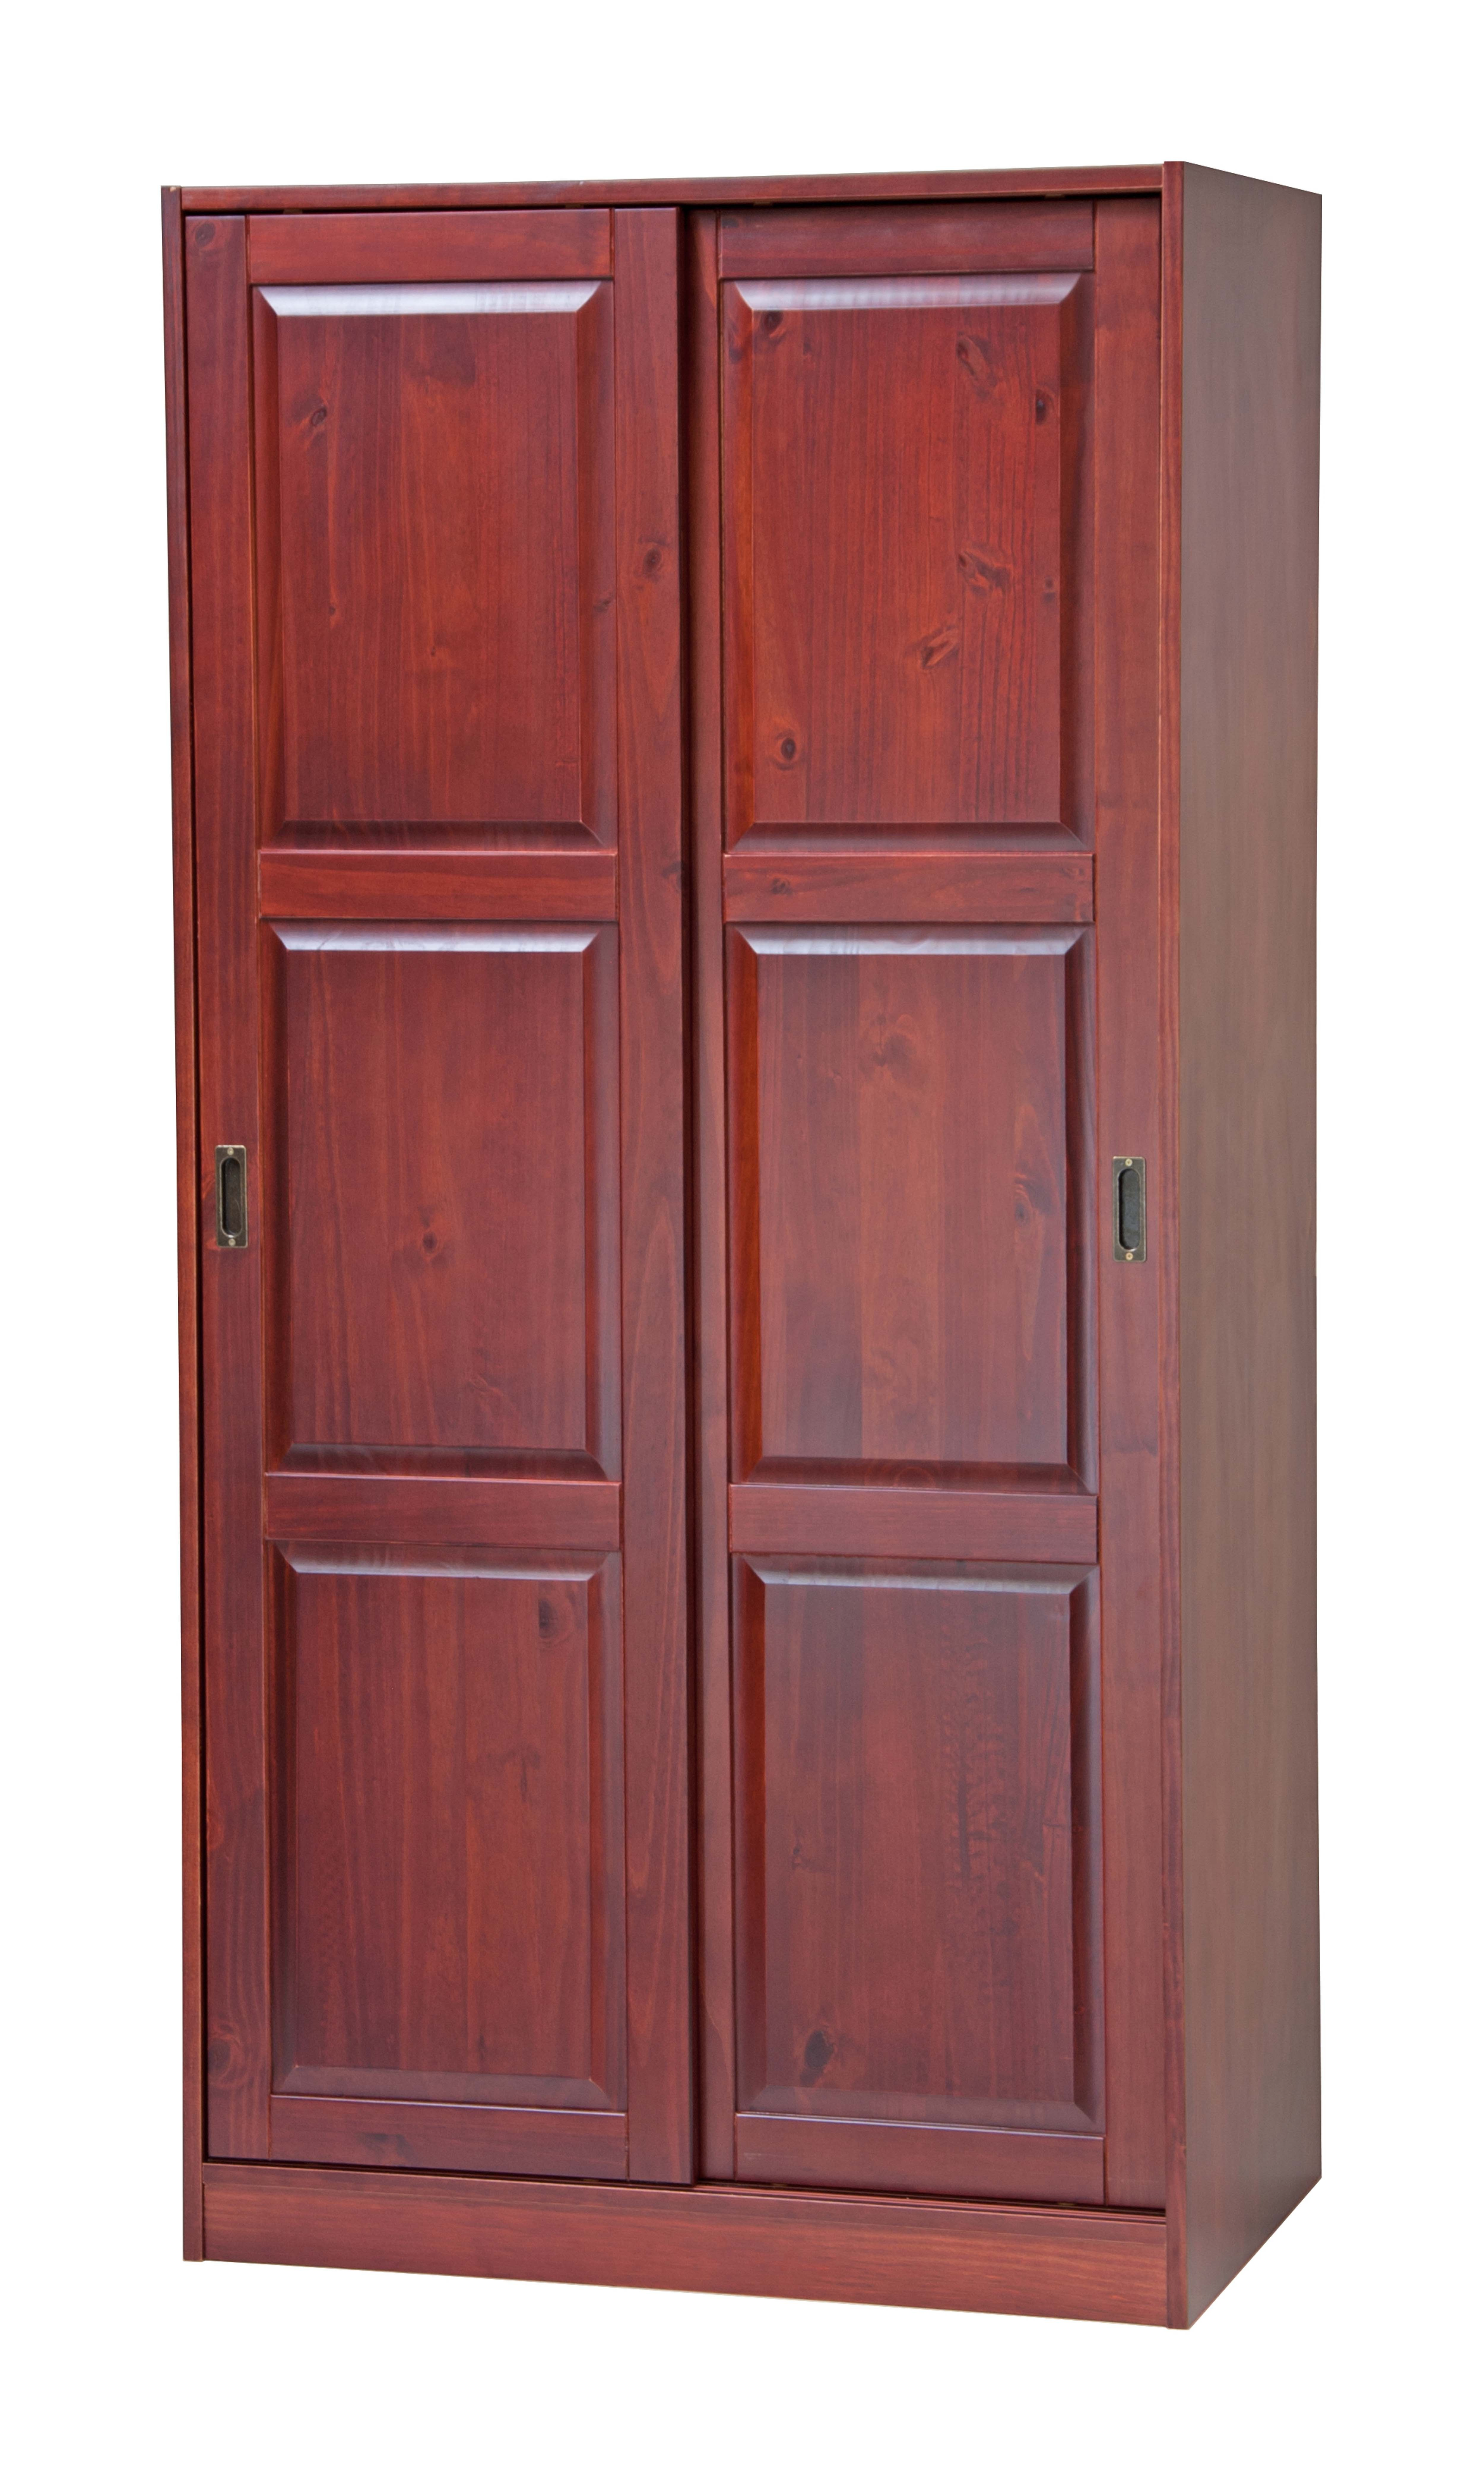 2 Sliding Door Solid Wood Wardrobe Closet Armoire With Shelf In Mahogany